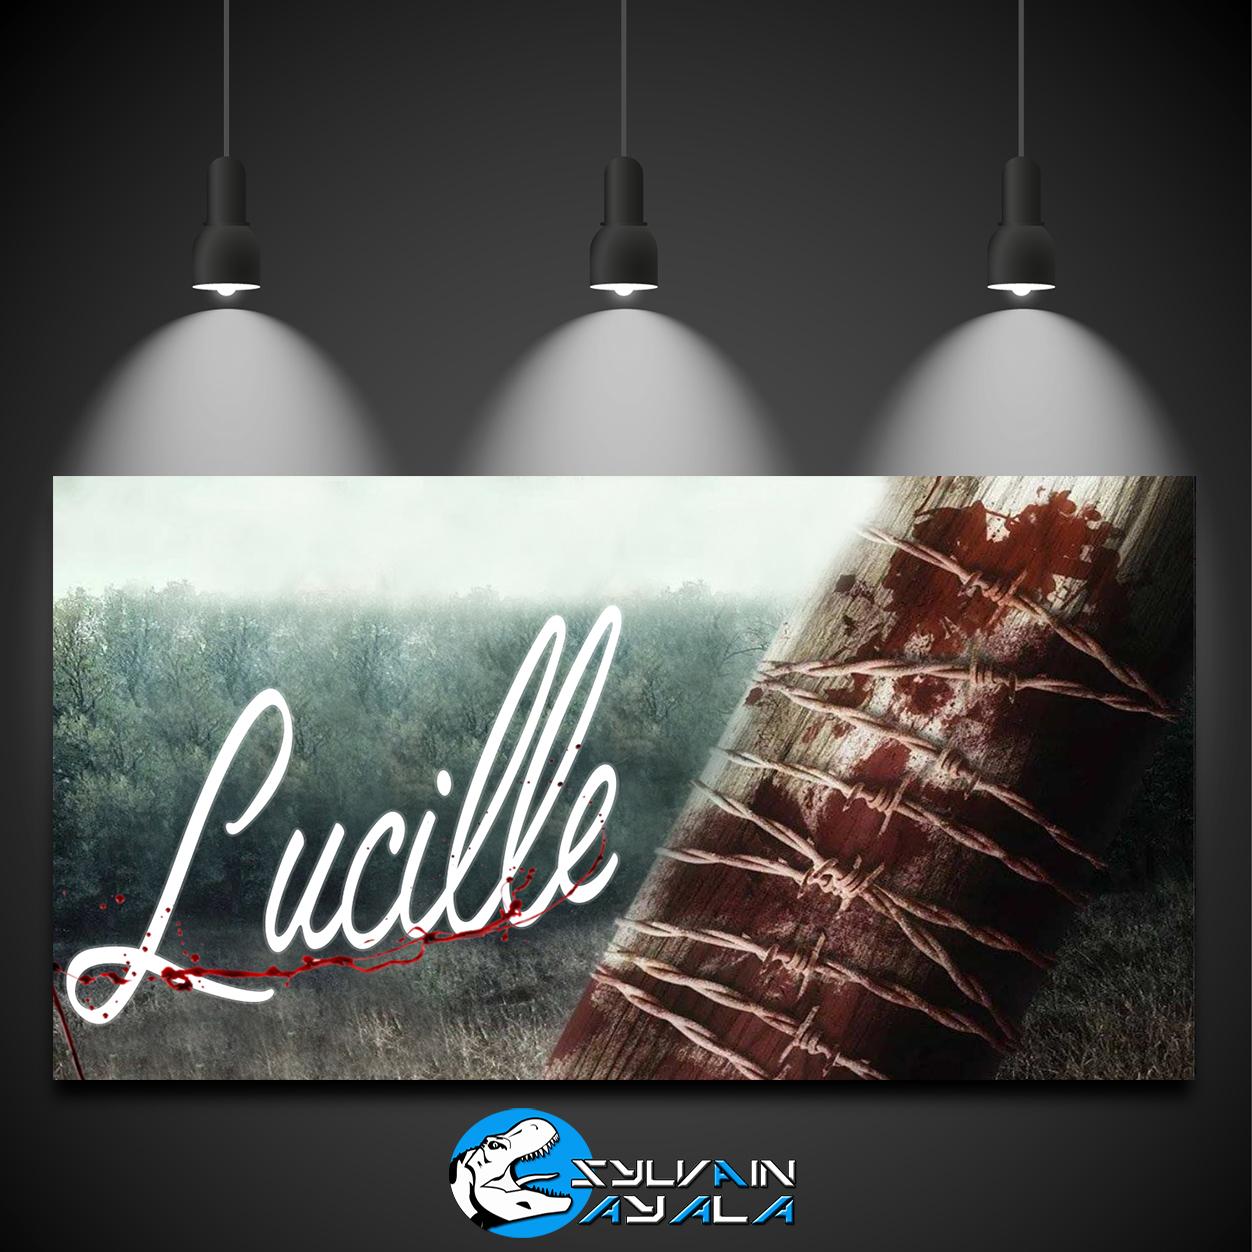 Sylvain AYALA - Lucille